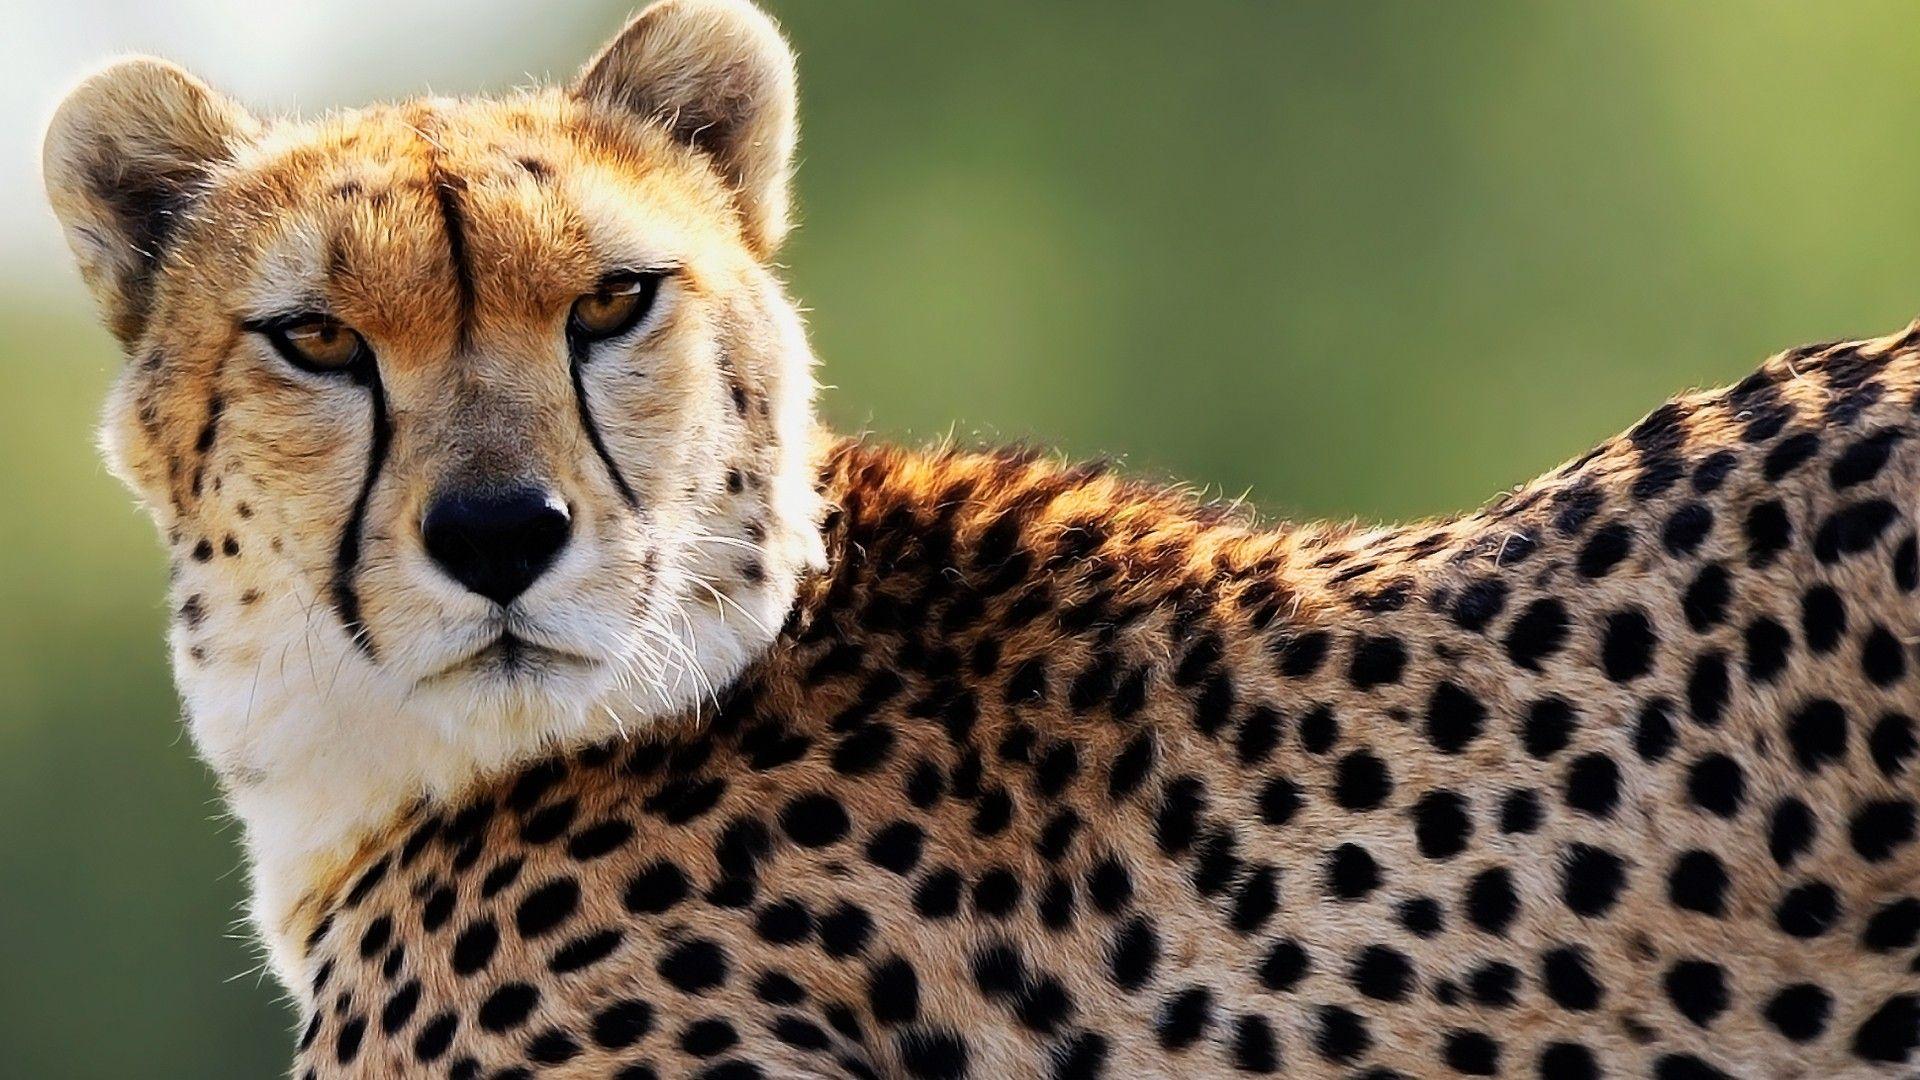 cheetah photography